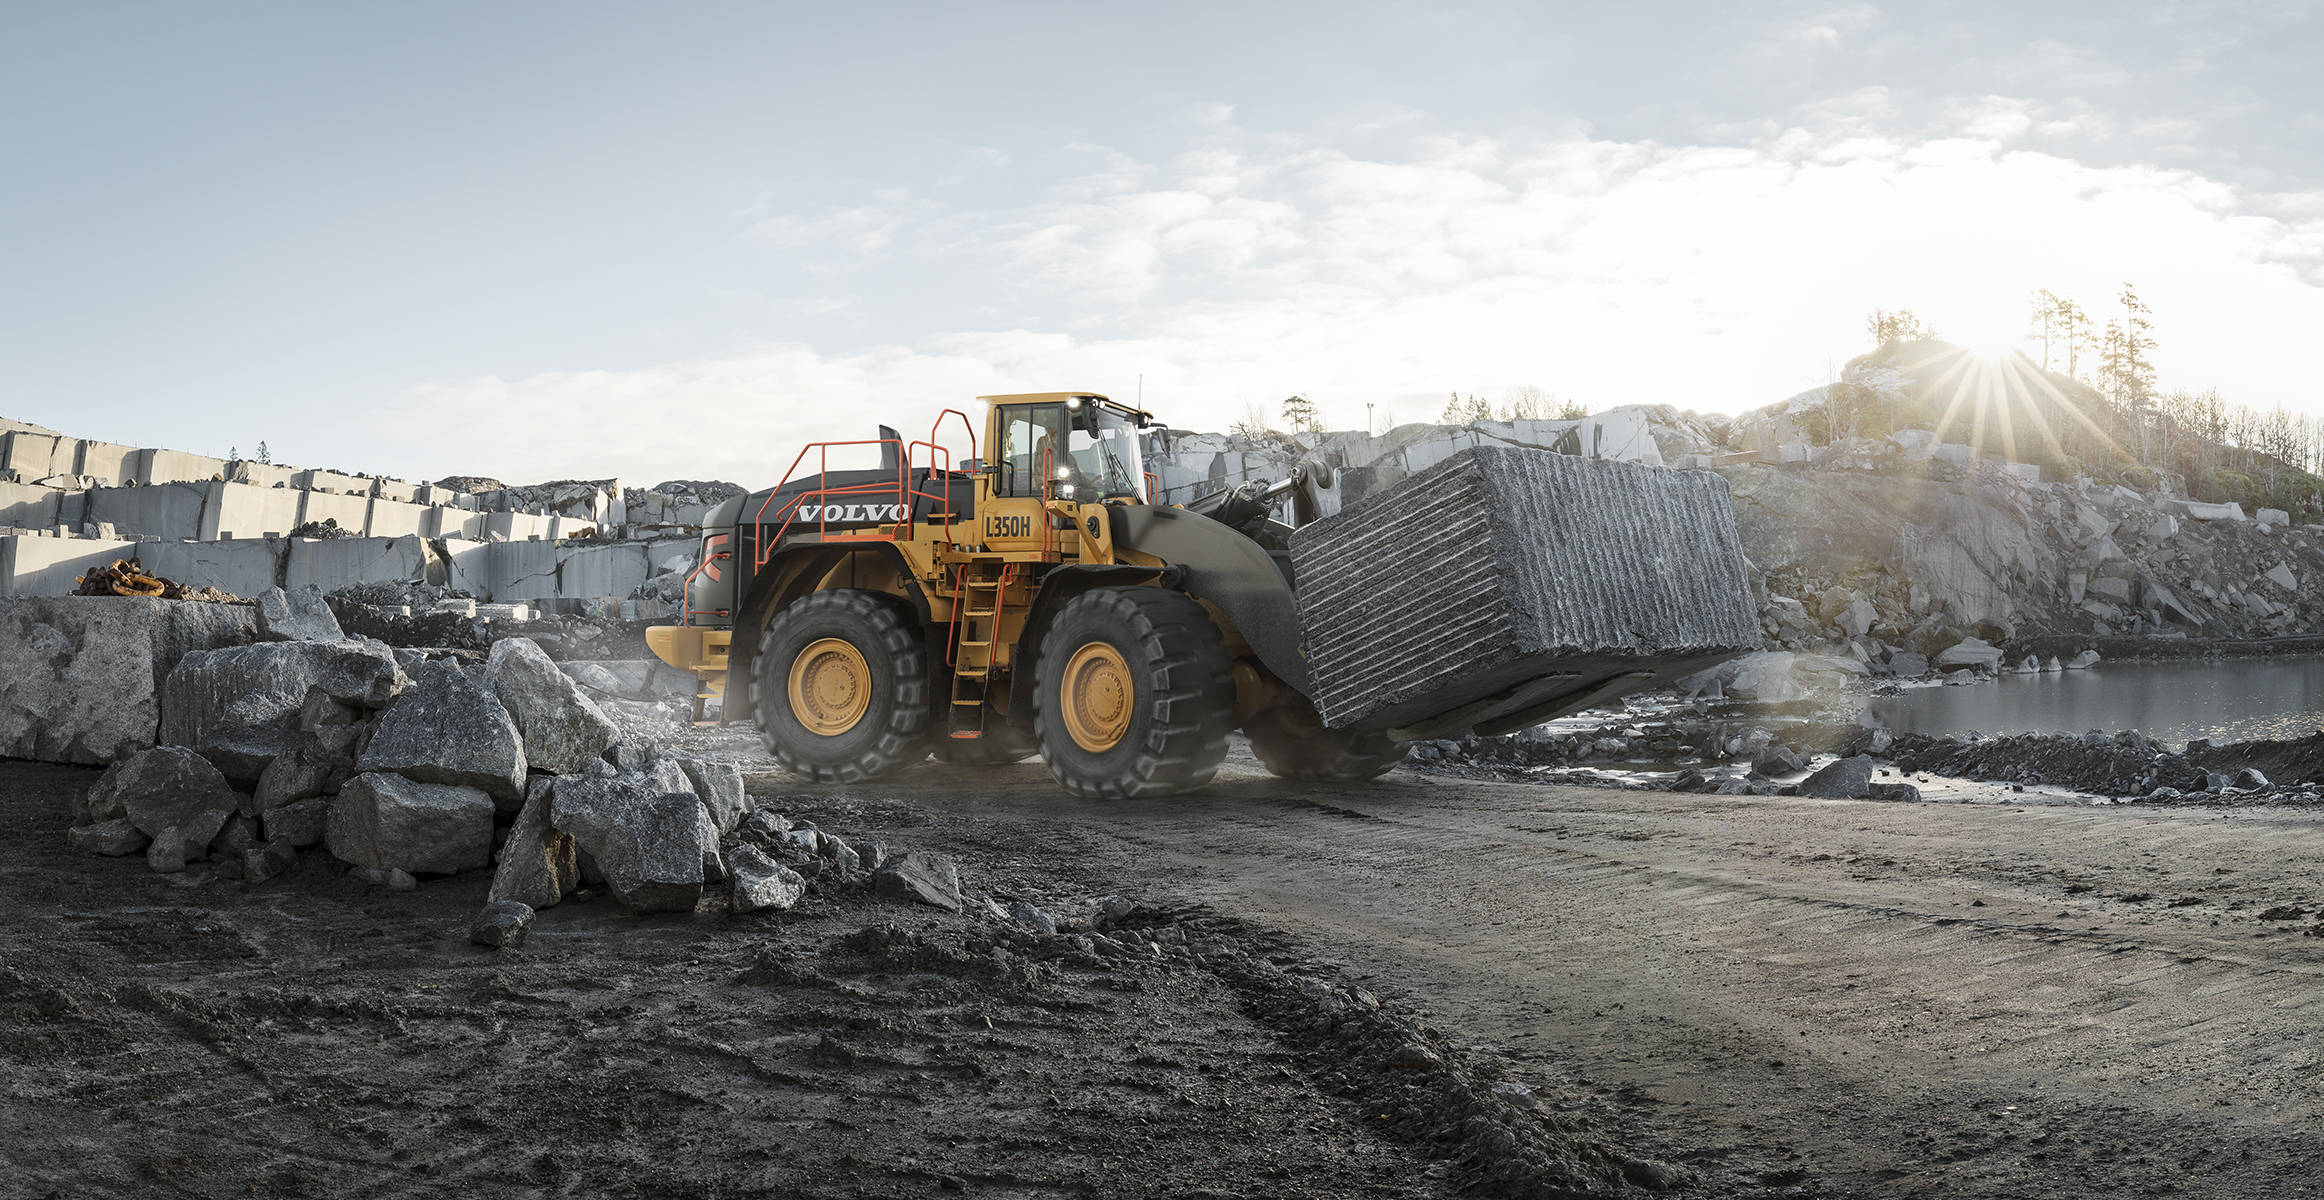 pale grandi le ammiraglie Volvo-benefits-wheel-loader-l350h-t3-t4f-durable-by-design-2324x1200